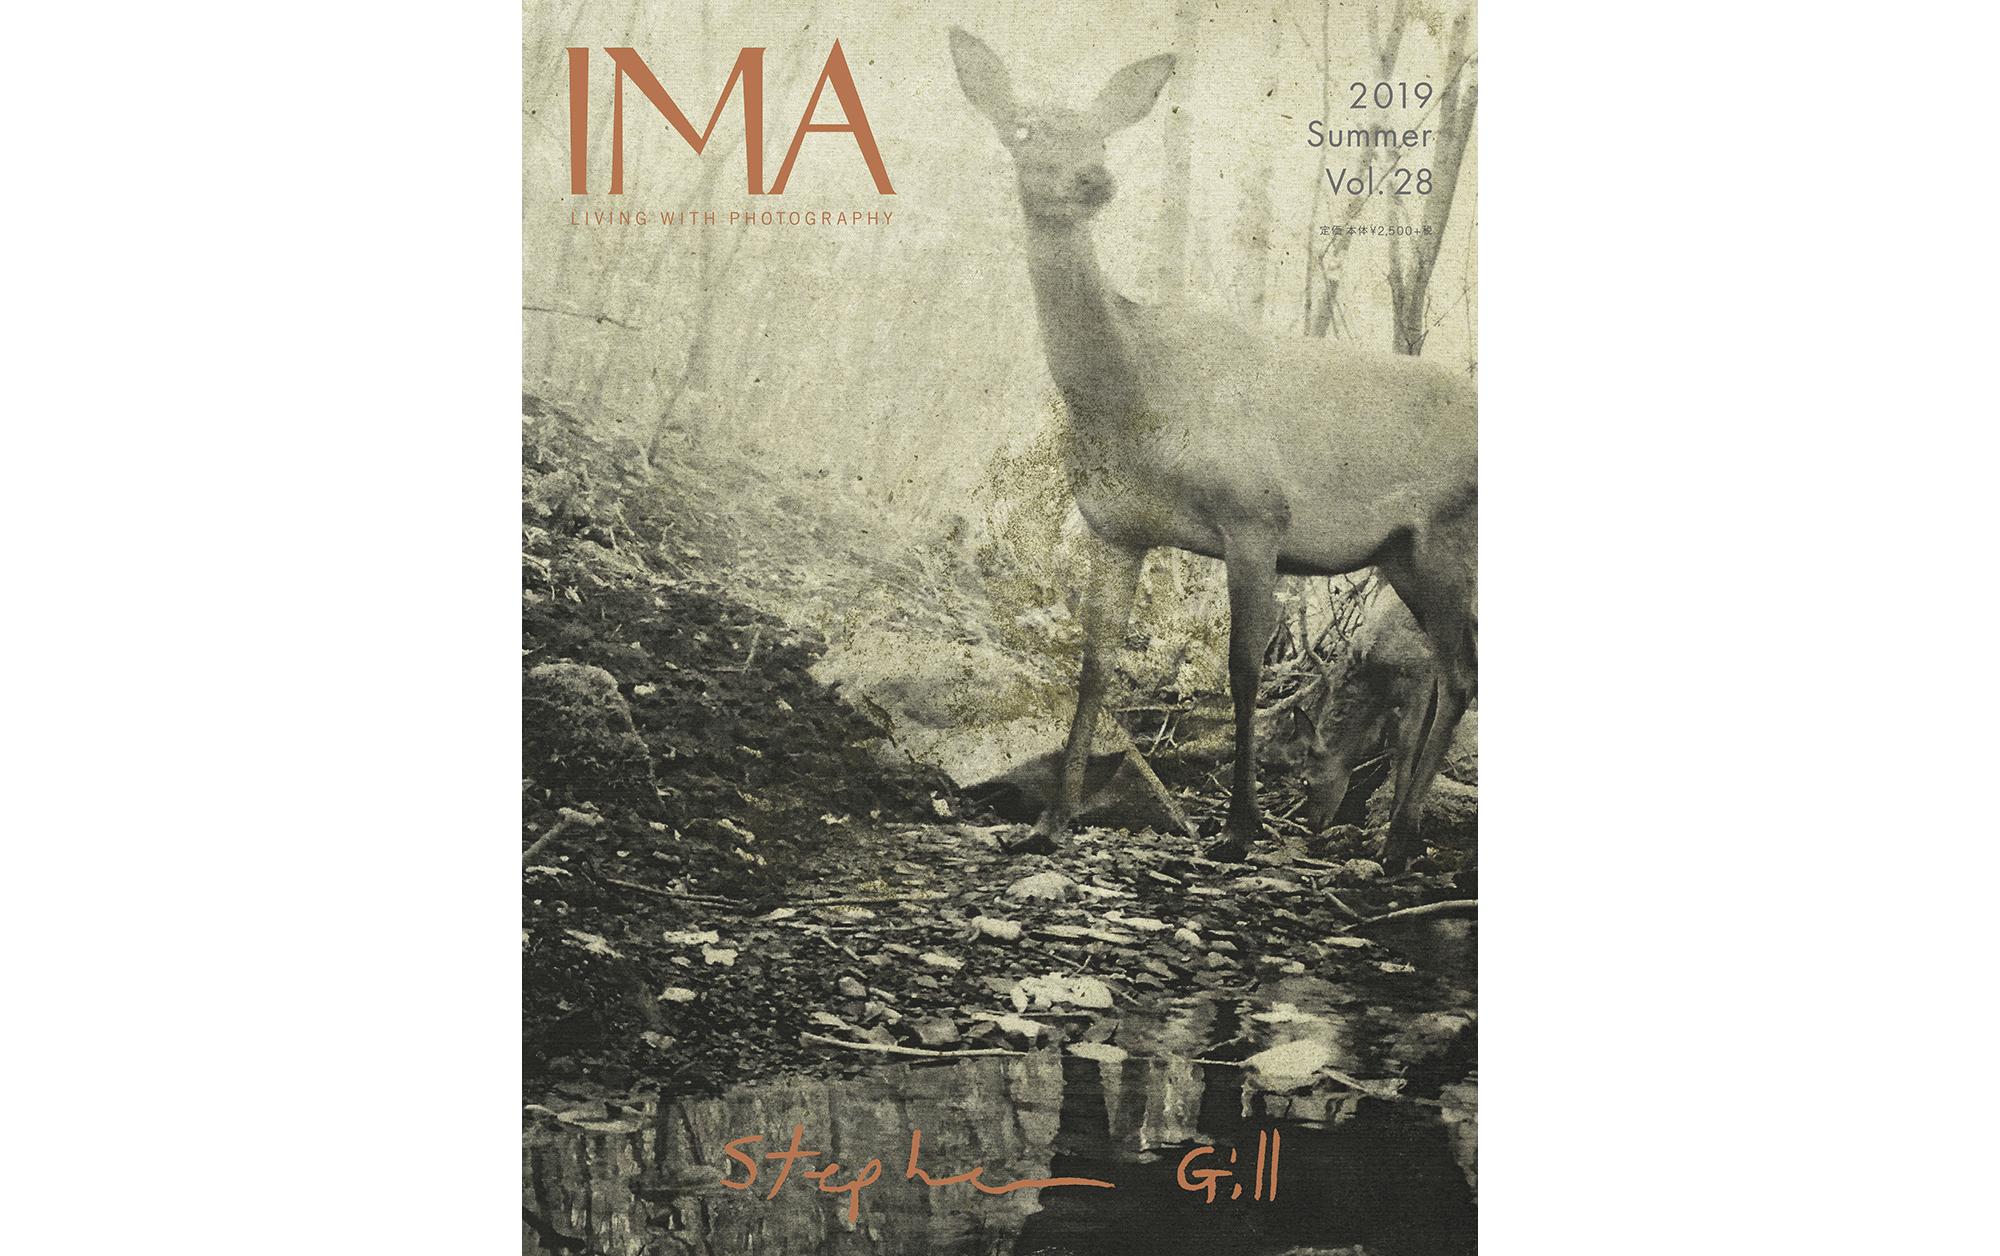 IMA 2019 Summer Vol.28